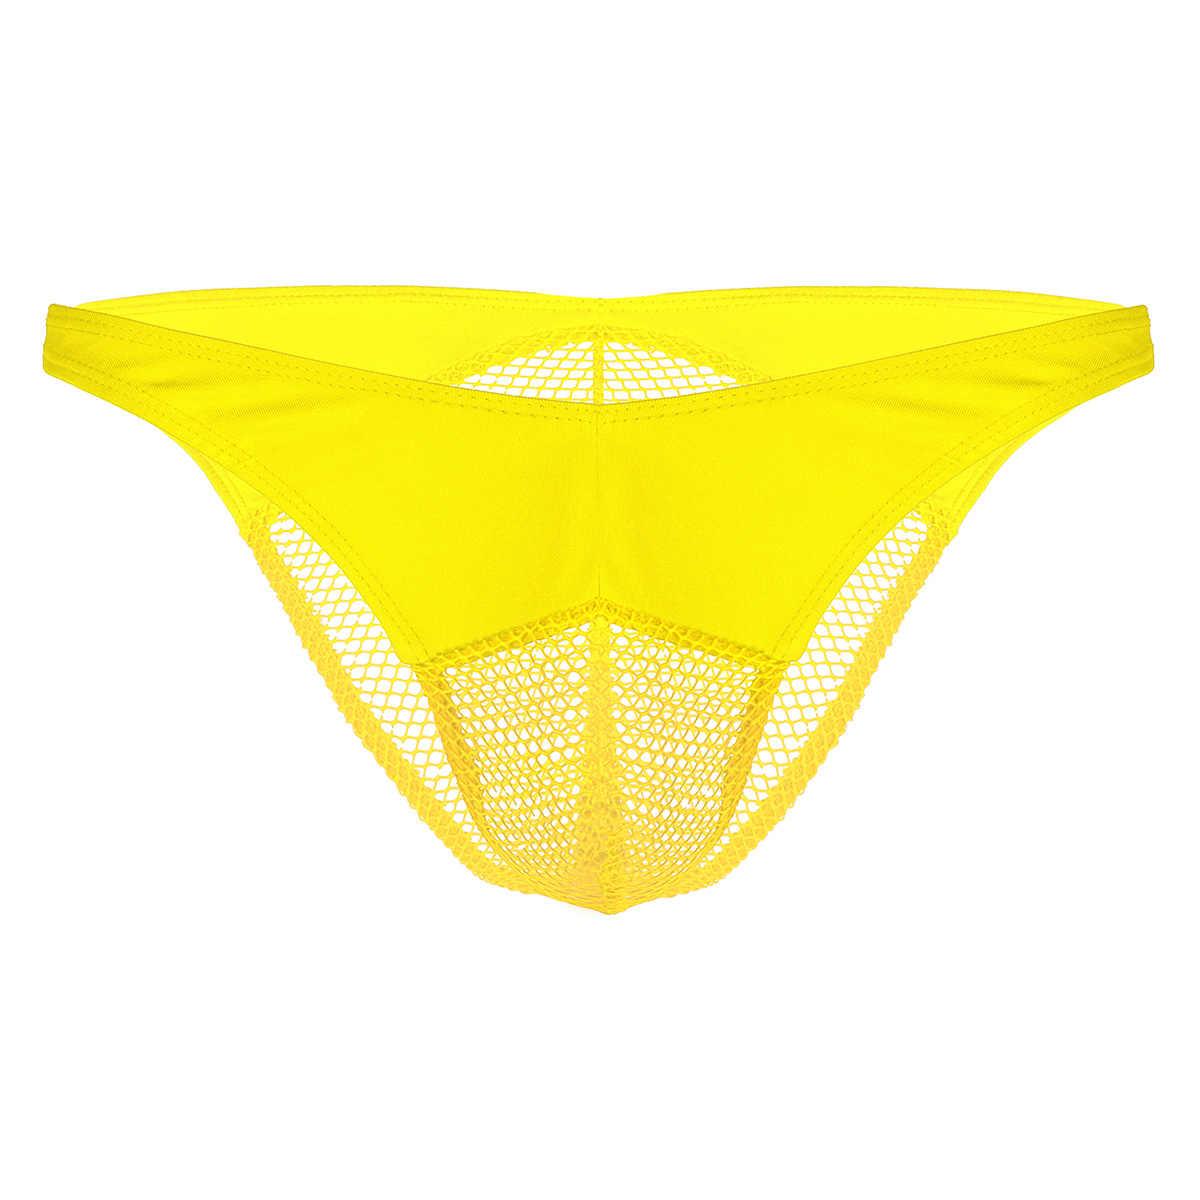 1ecc54096d53 ... 2019 Mens Sexy Thong Bikini Briefs Swimwear Men Panties Bottoms Sissy  Gay Lingerie Fishnet Pouch Thongs ...